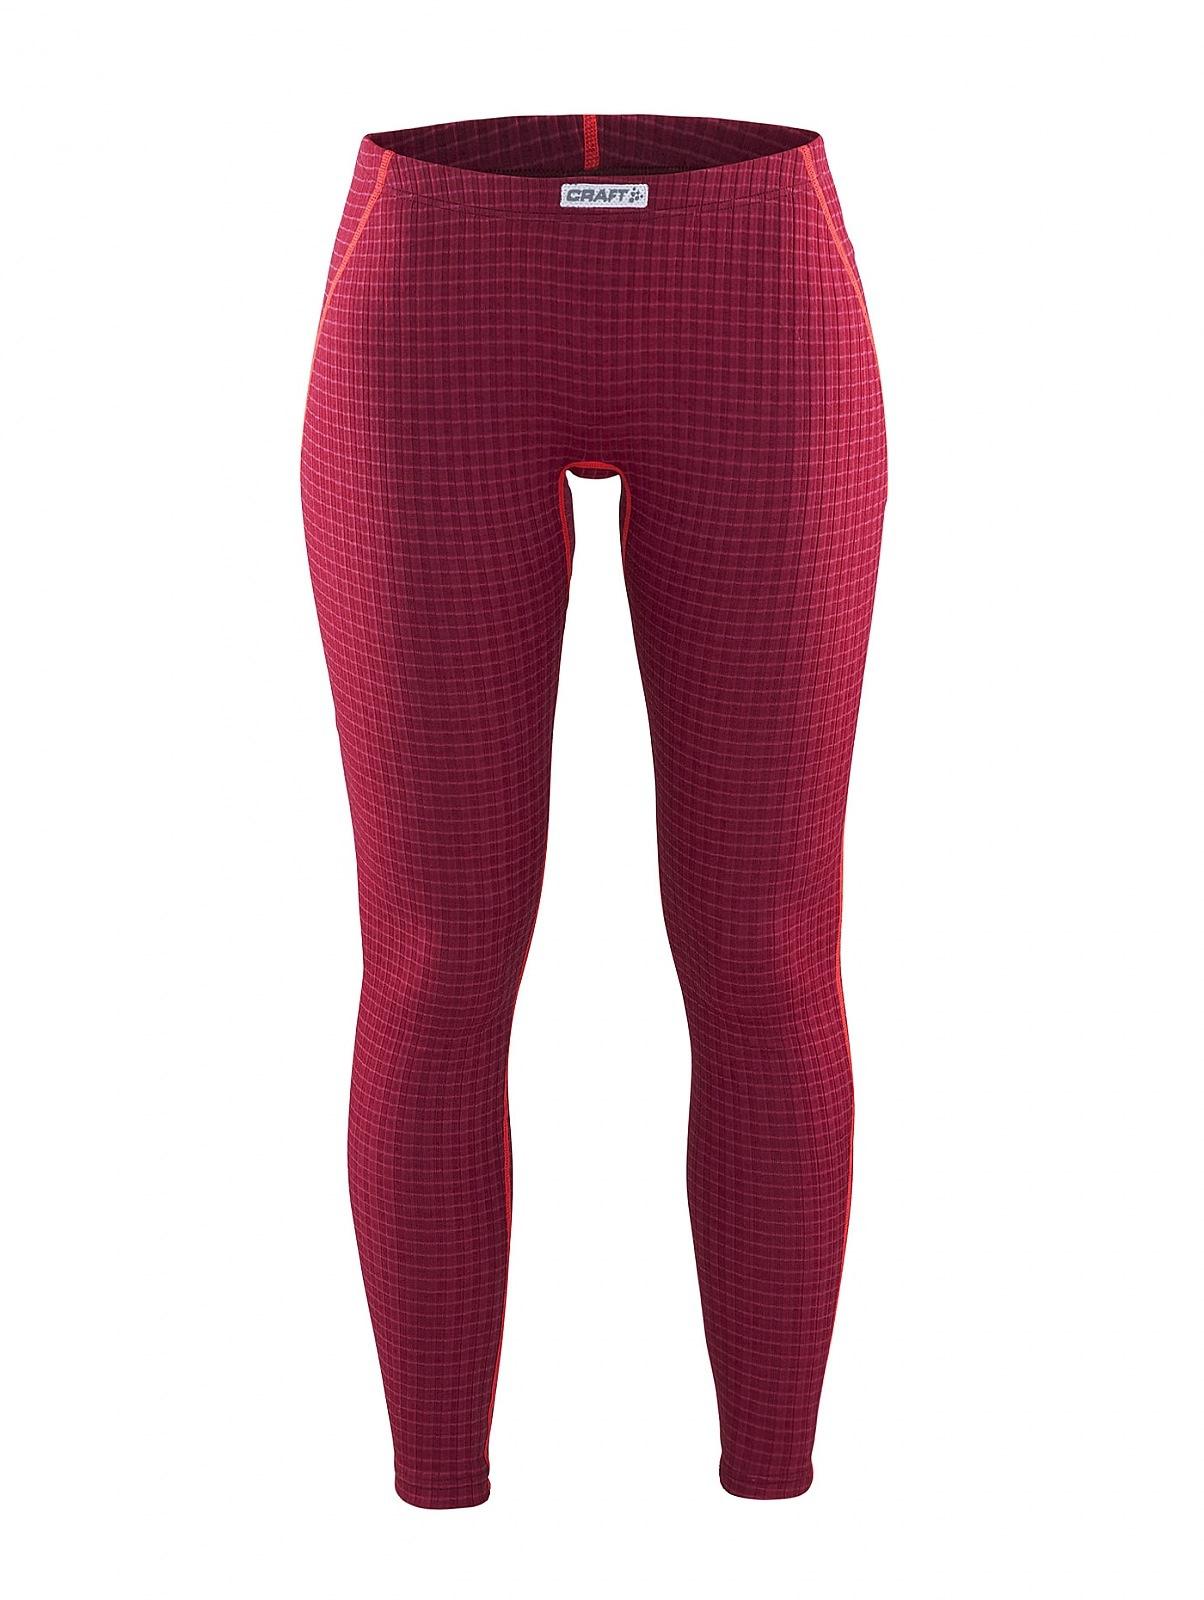 Женское термобелье кальсоны Craft Warm Wool Red (1903725-2482)